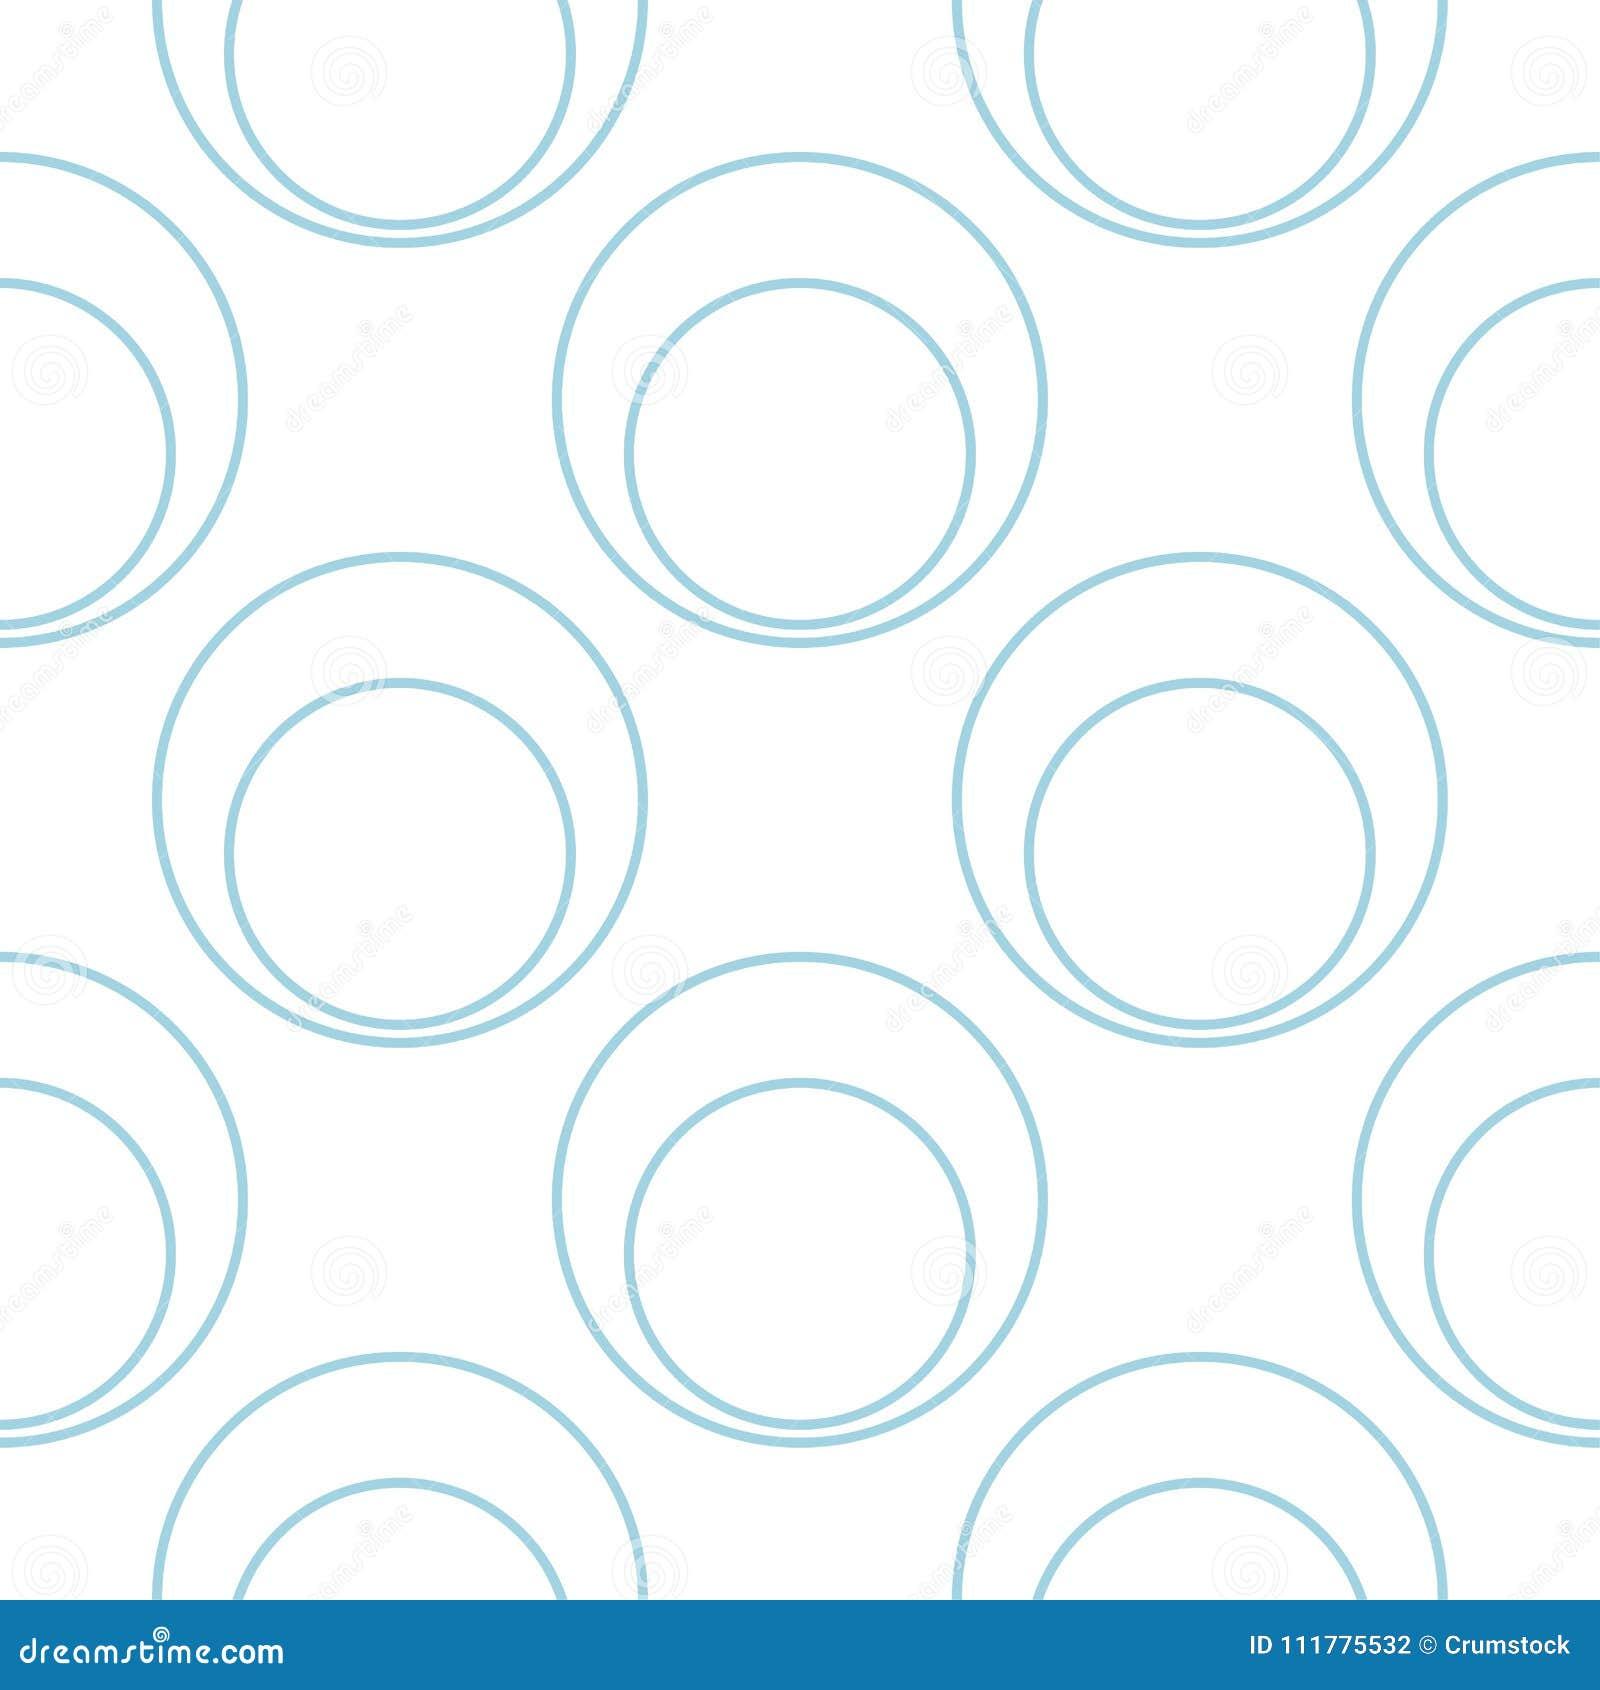 White and blue geometric ornament. Seamless pattern